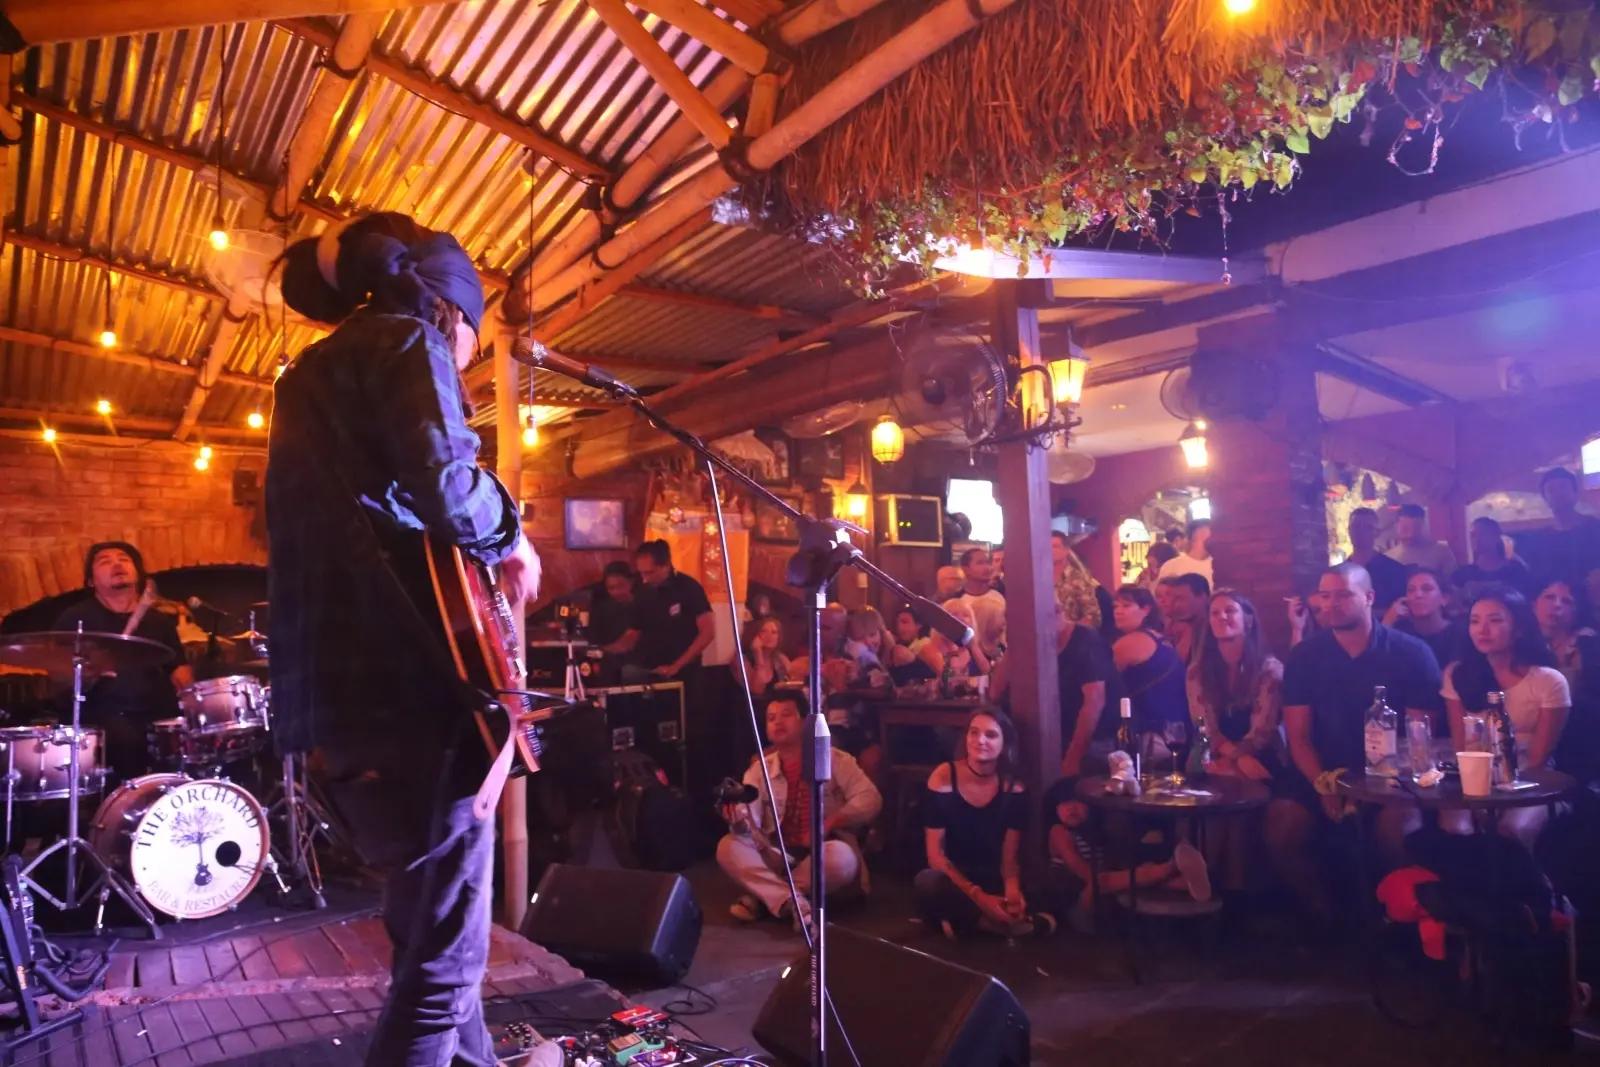 the orchard bar & restaurant - Live Music Bali flokq